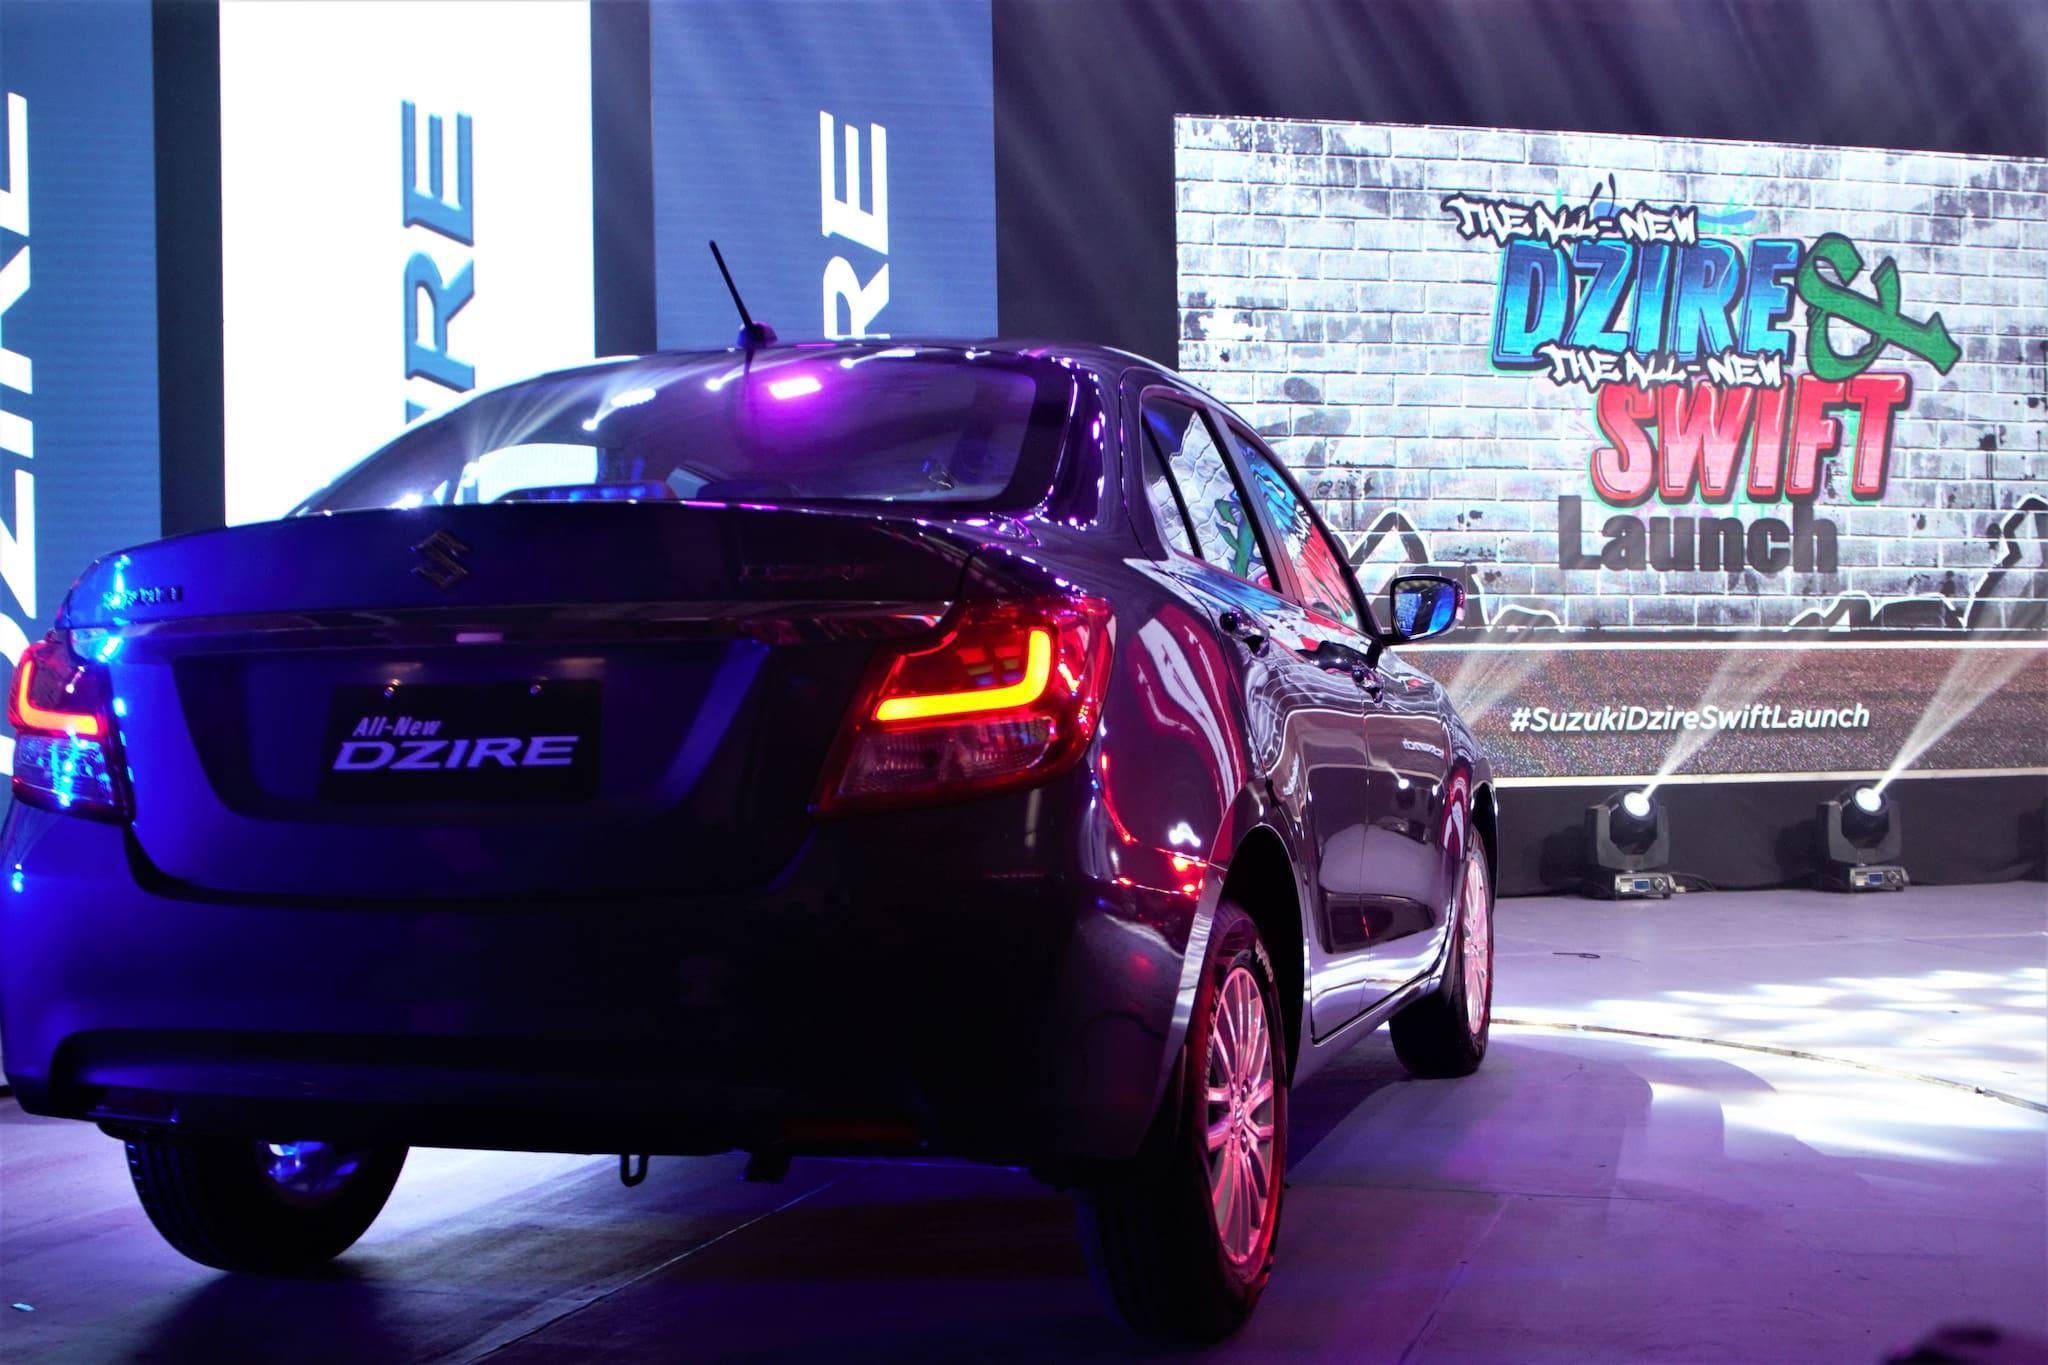 Suzuki PH Finally Launches All-New Suzuki Dzire, Suzuki Swift